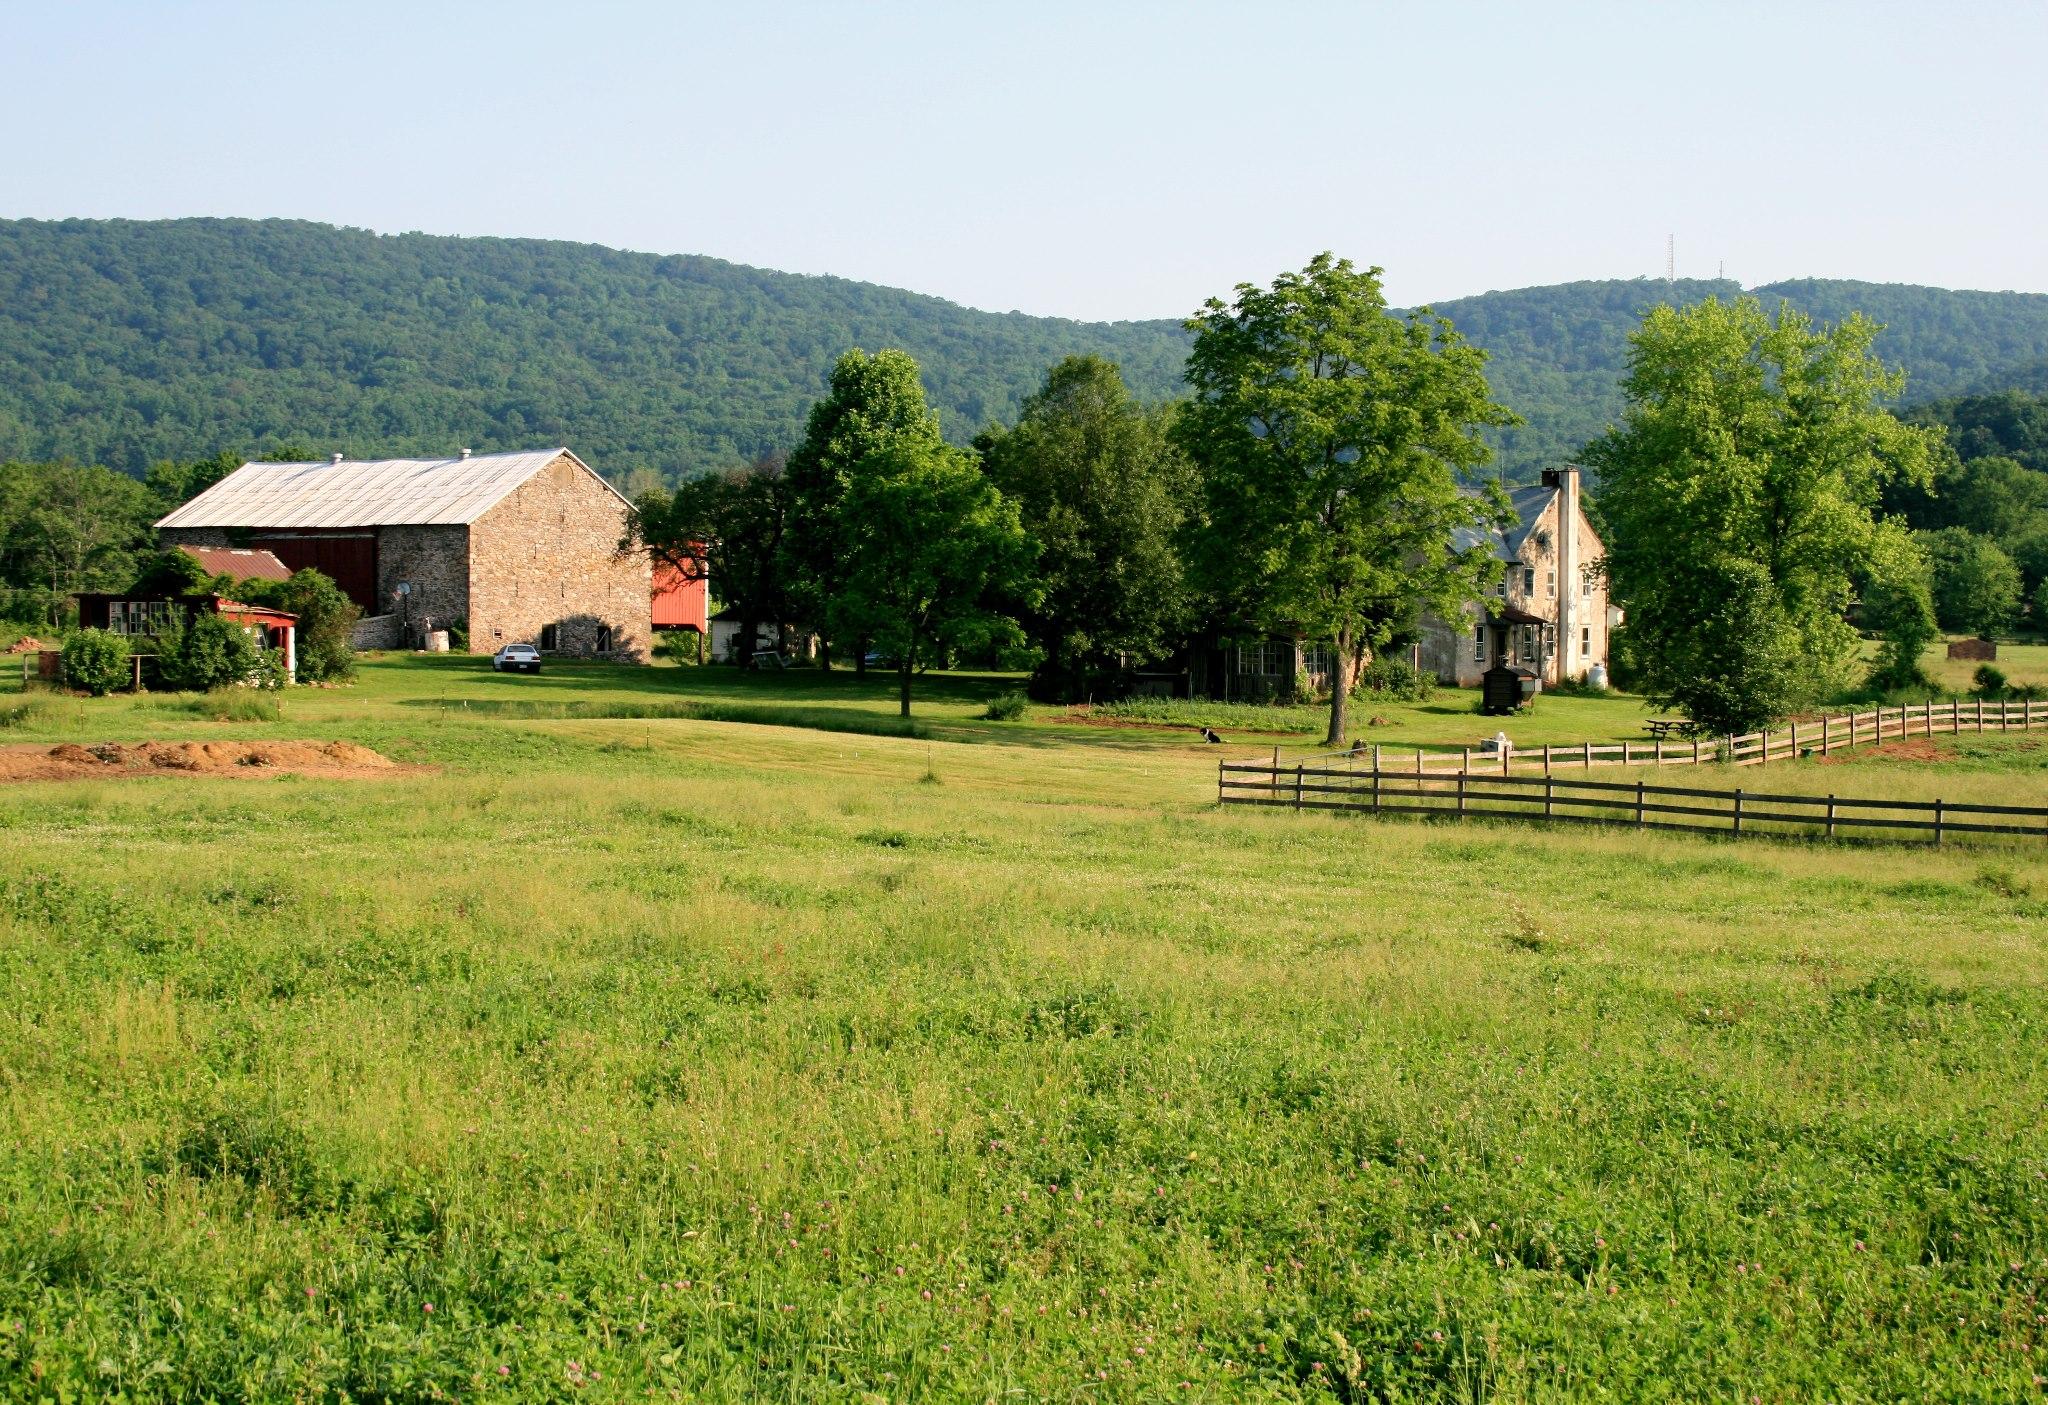 Nurturing Nature Farm